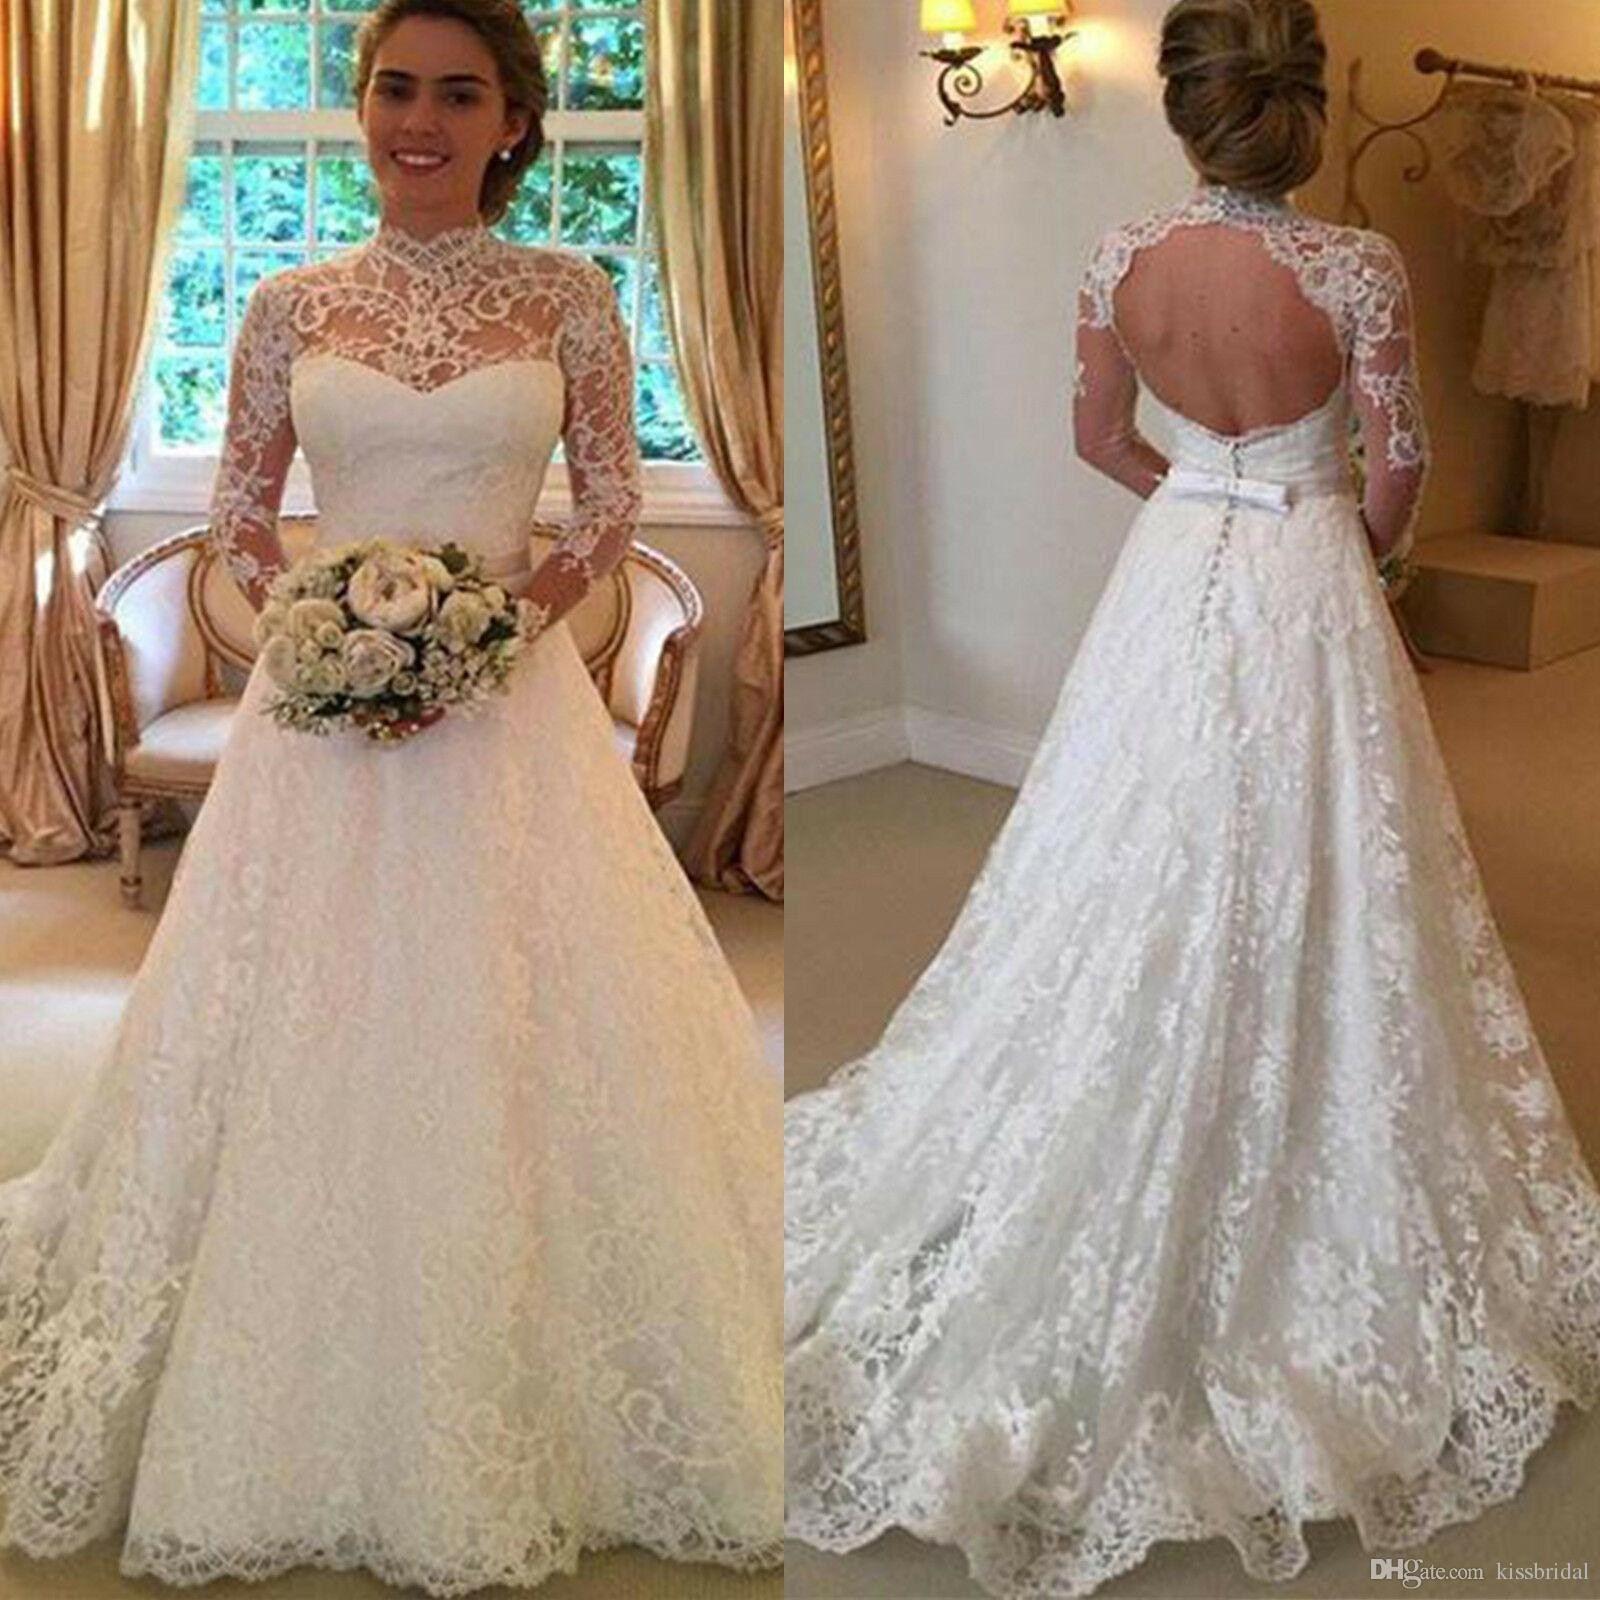 59 Inspirational Long Sleeve Vintage Wedding Dresses Pictures Wedding Dress Gallery Long Sleeve Wedding Dress Lace Sheer Bridal Gown Wedding Gowns Lace [ 1600 x 1600 Pixel ]